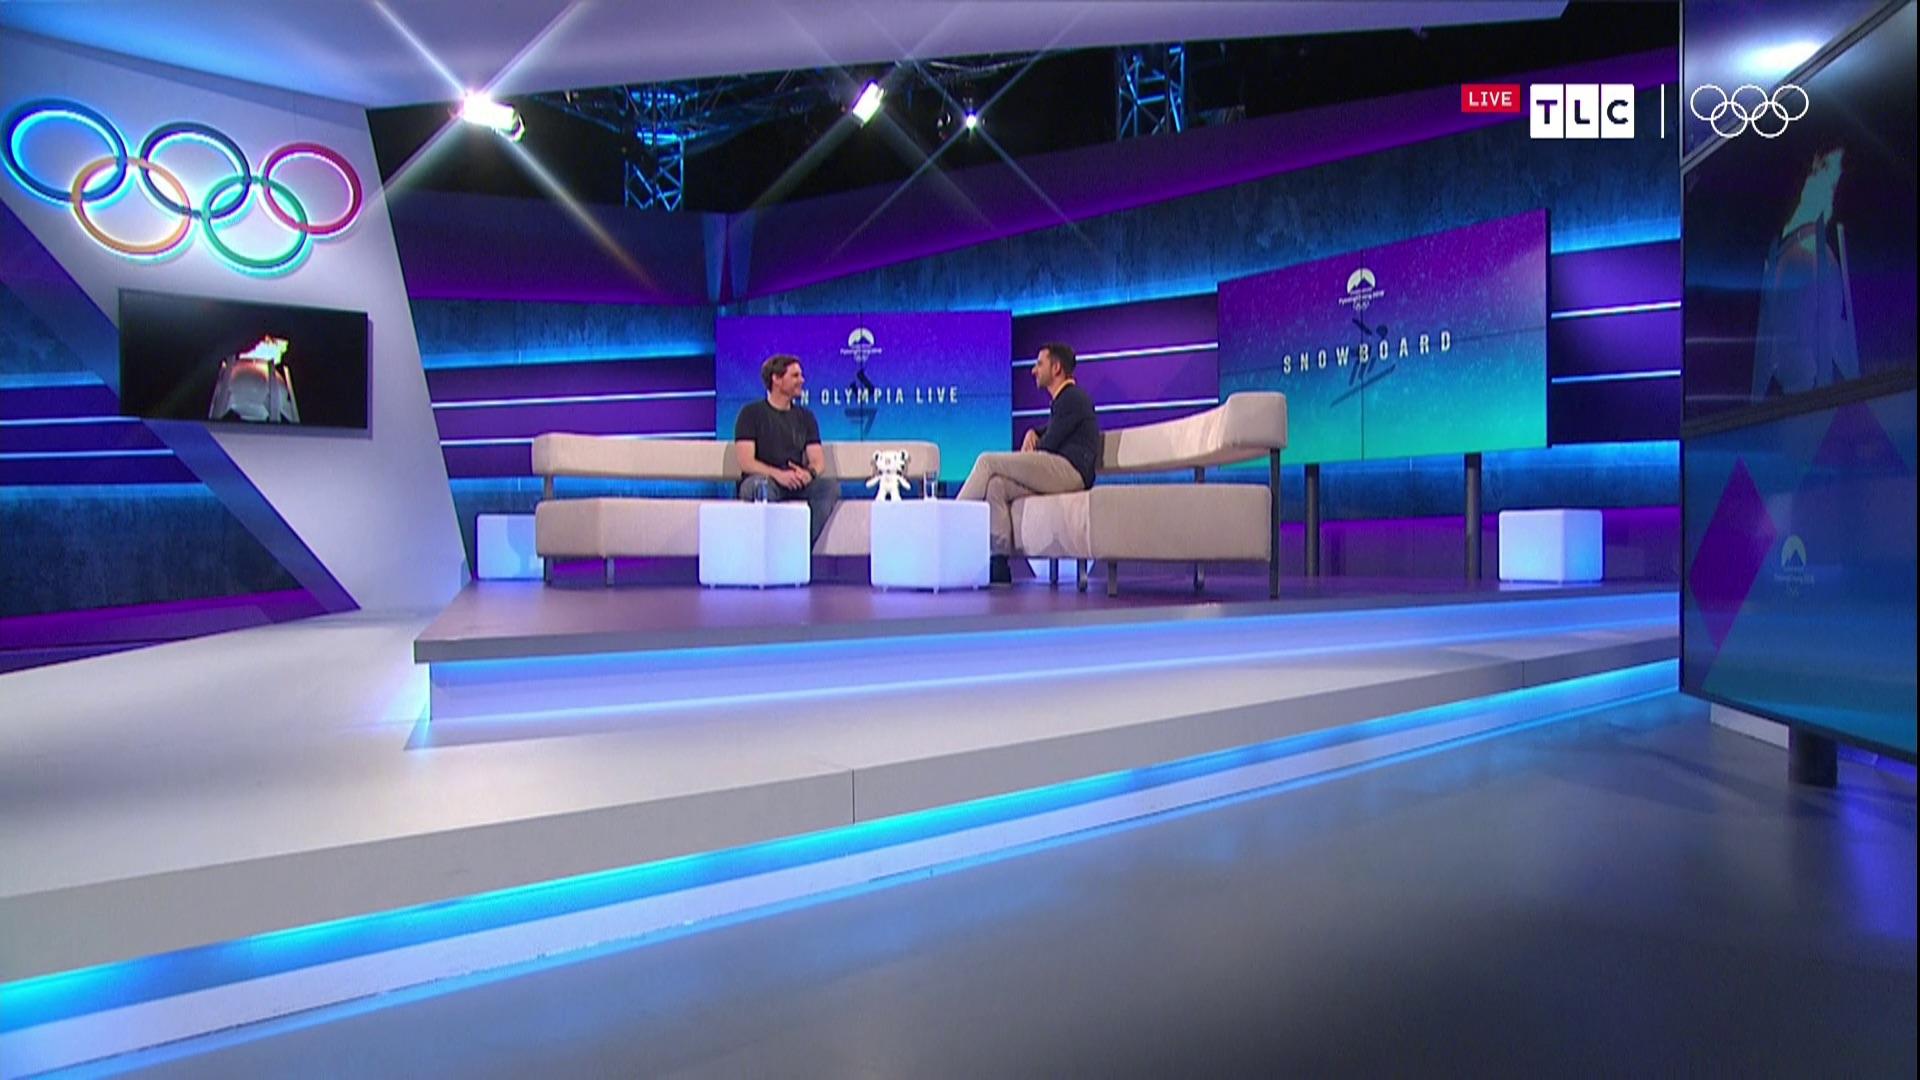 ncs_eurosport-pyeongchang-olympic-tv-studio_0017